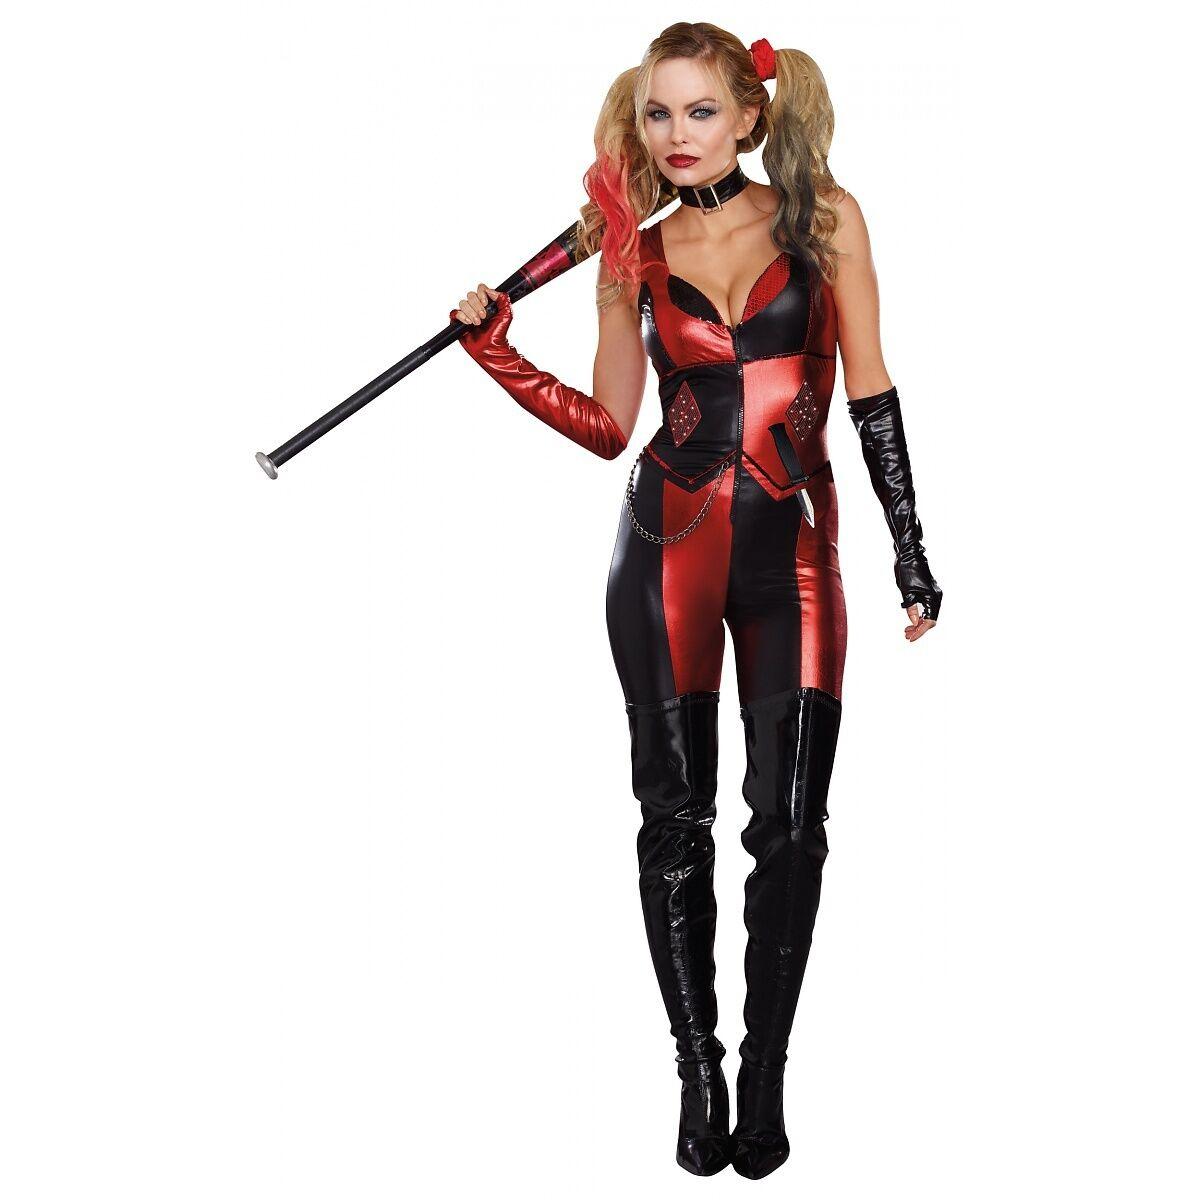 Harley Quinn Costume Adult Harlequin Halloween Fancy Dress